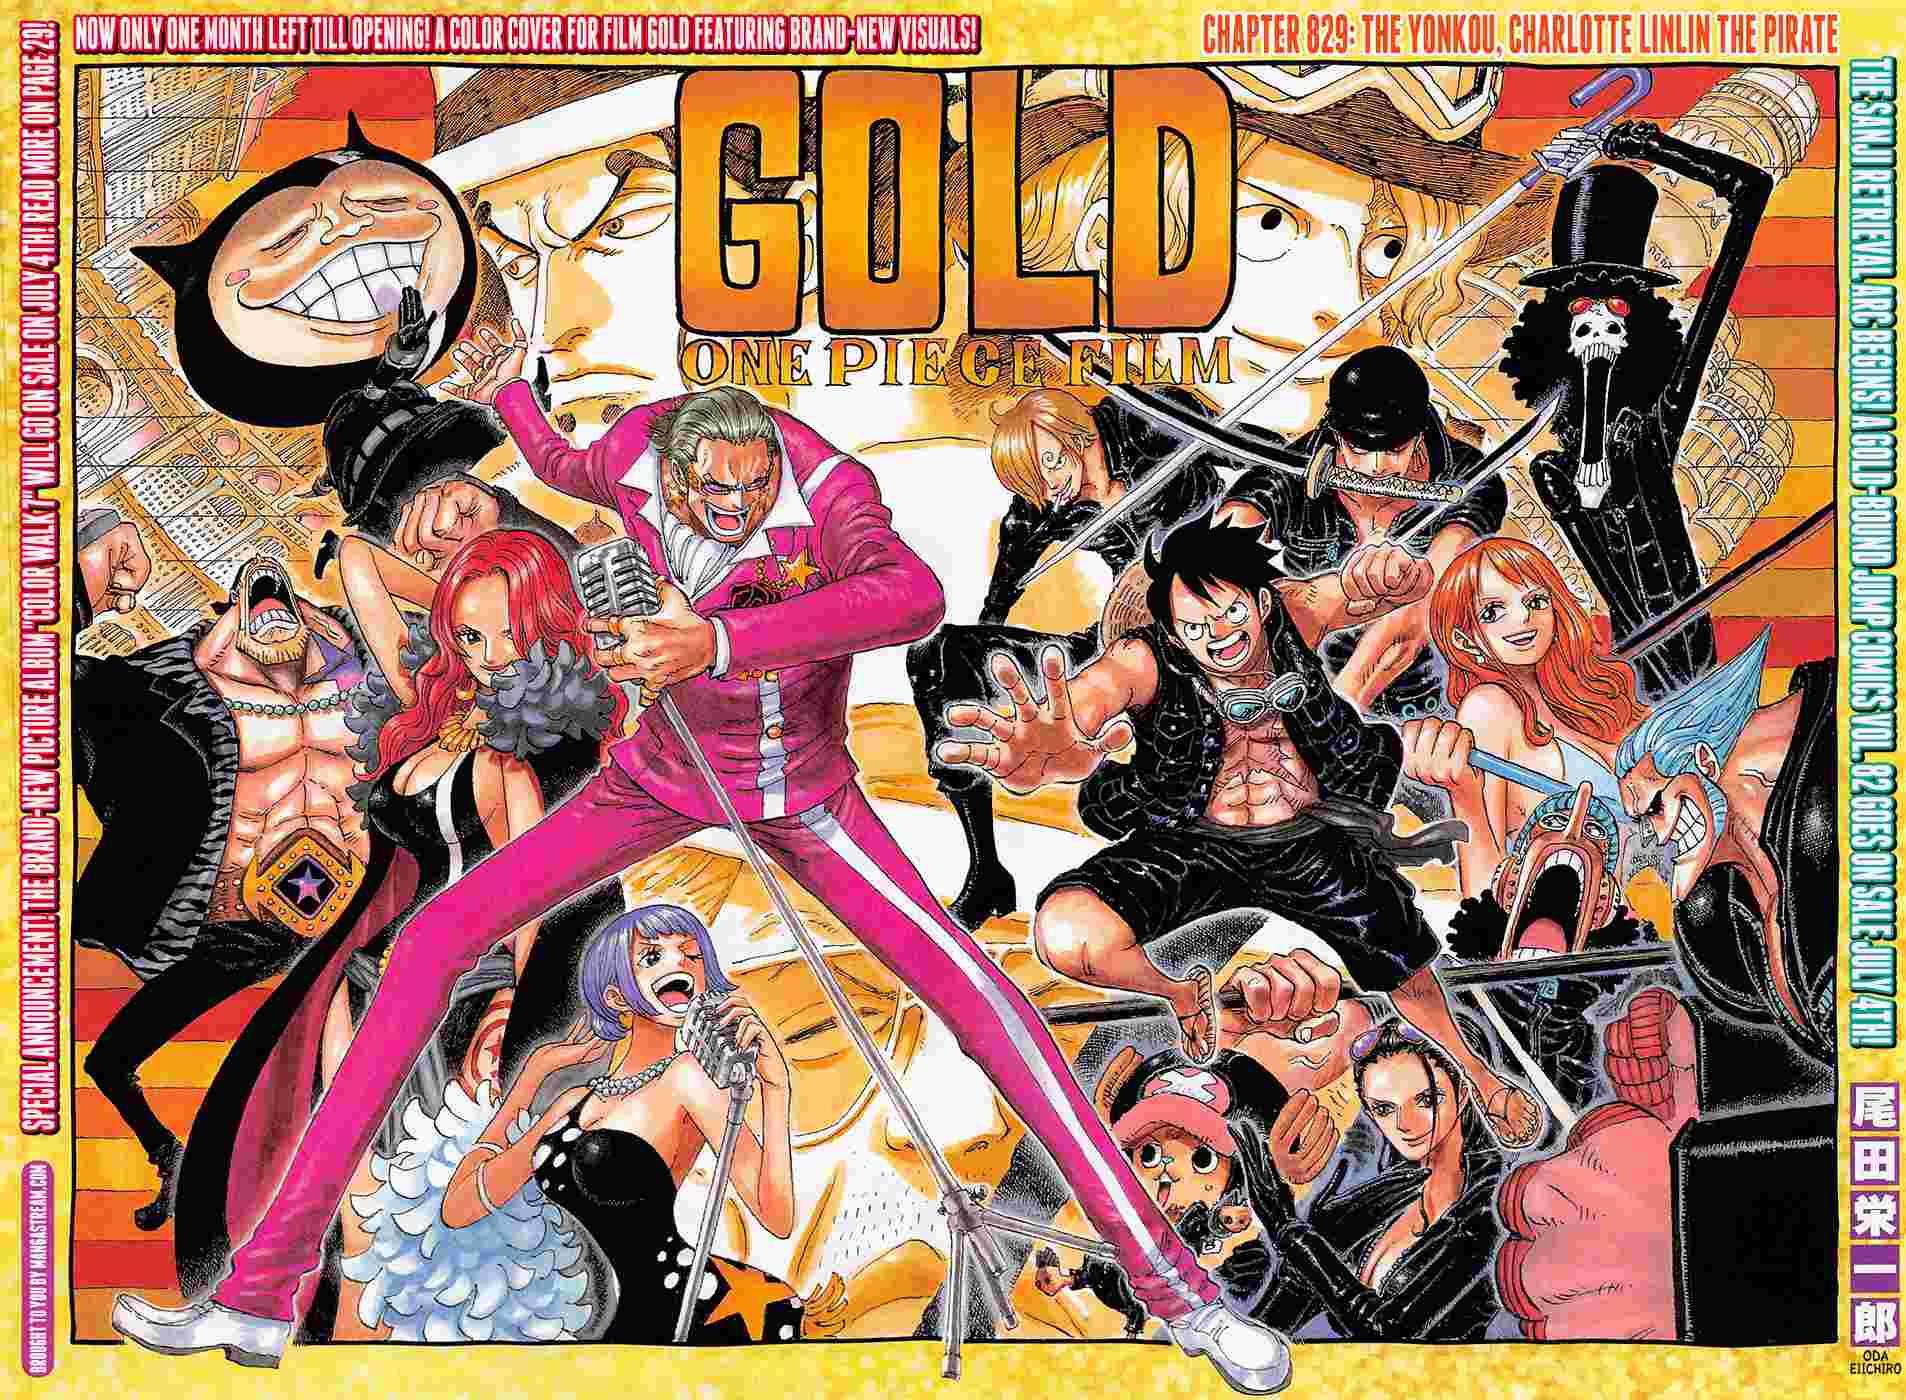 One Piece Chapter 829: Hải tặc, Tứ Hoàng Charlotte Linlin 002_0010